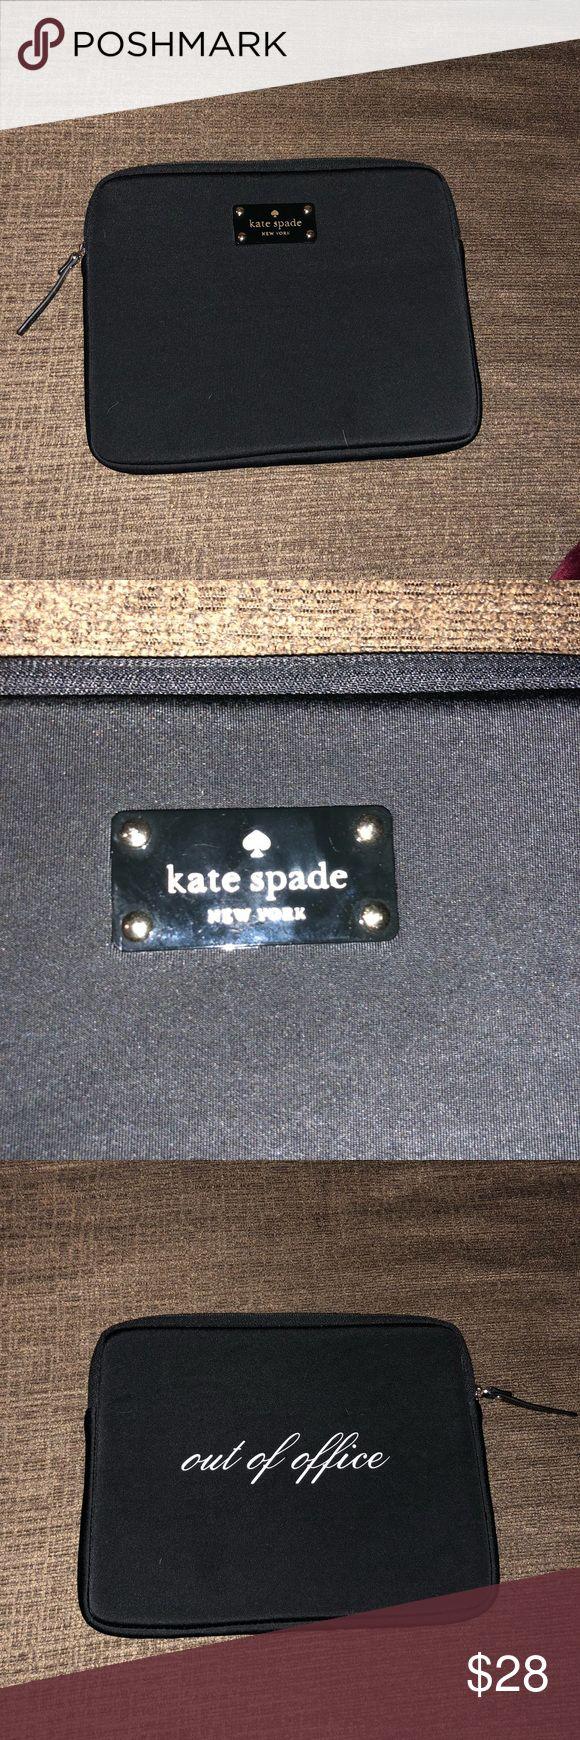 Kate Spade iPad Air case EUC. Chic iPad sleeve. kate spade Accessories Laptop Cases